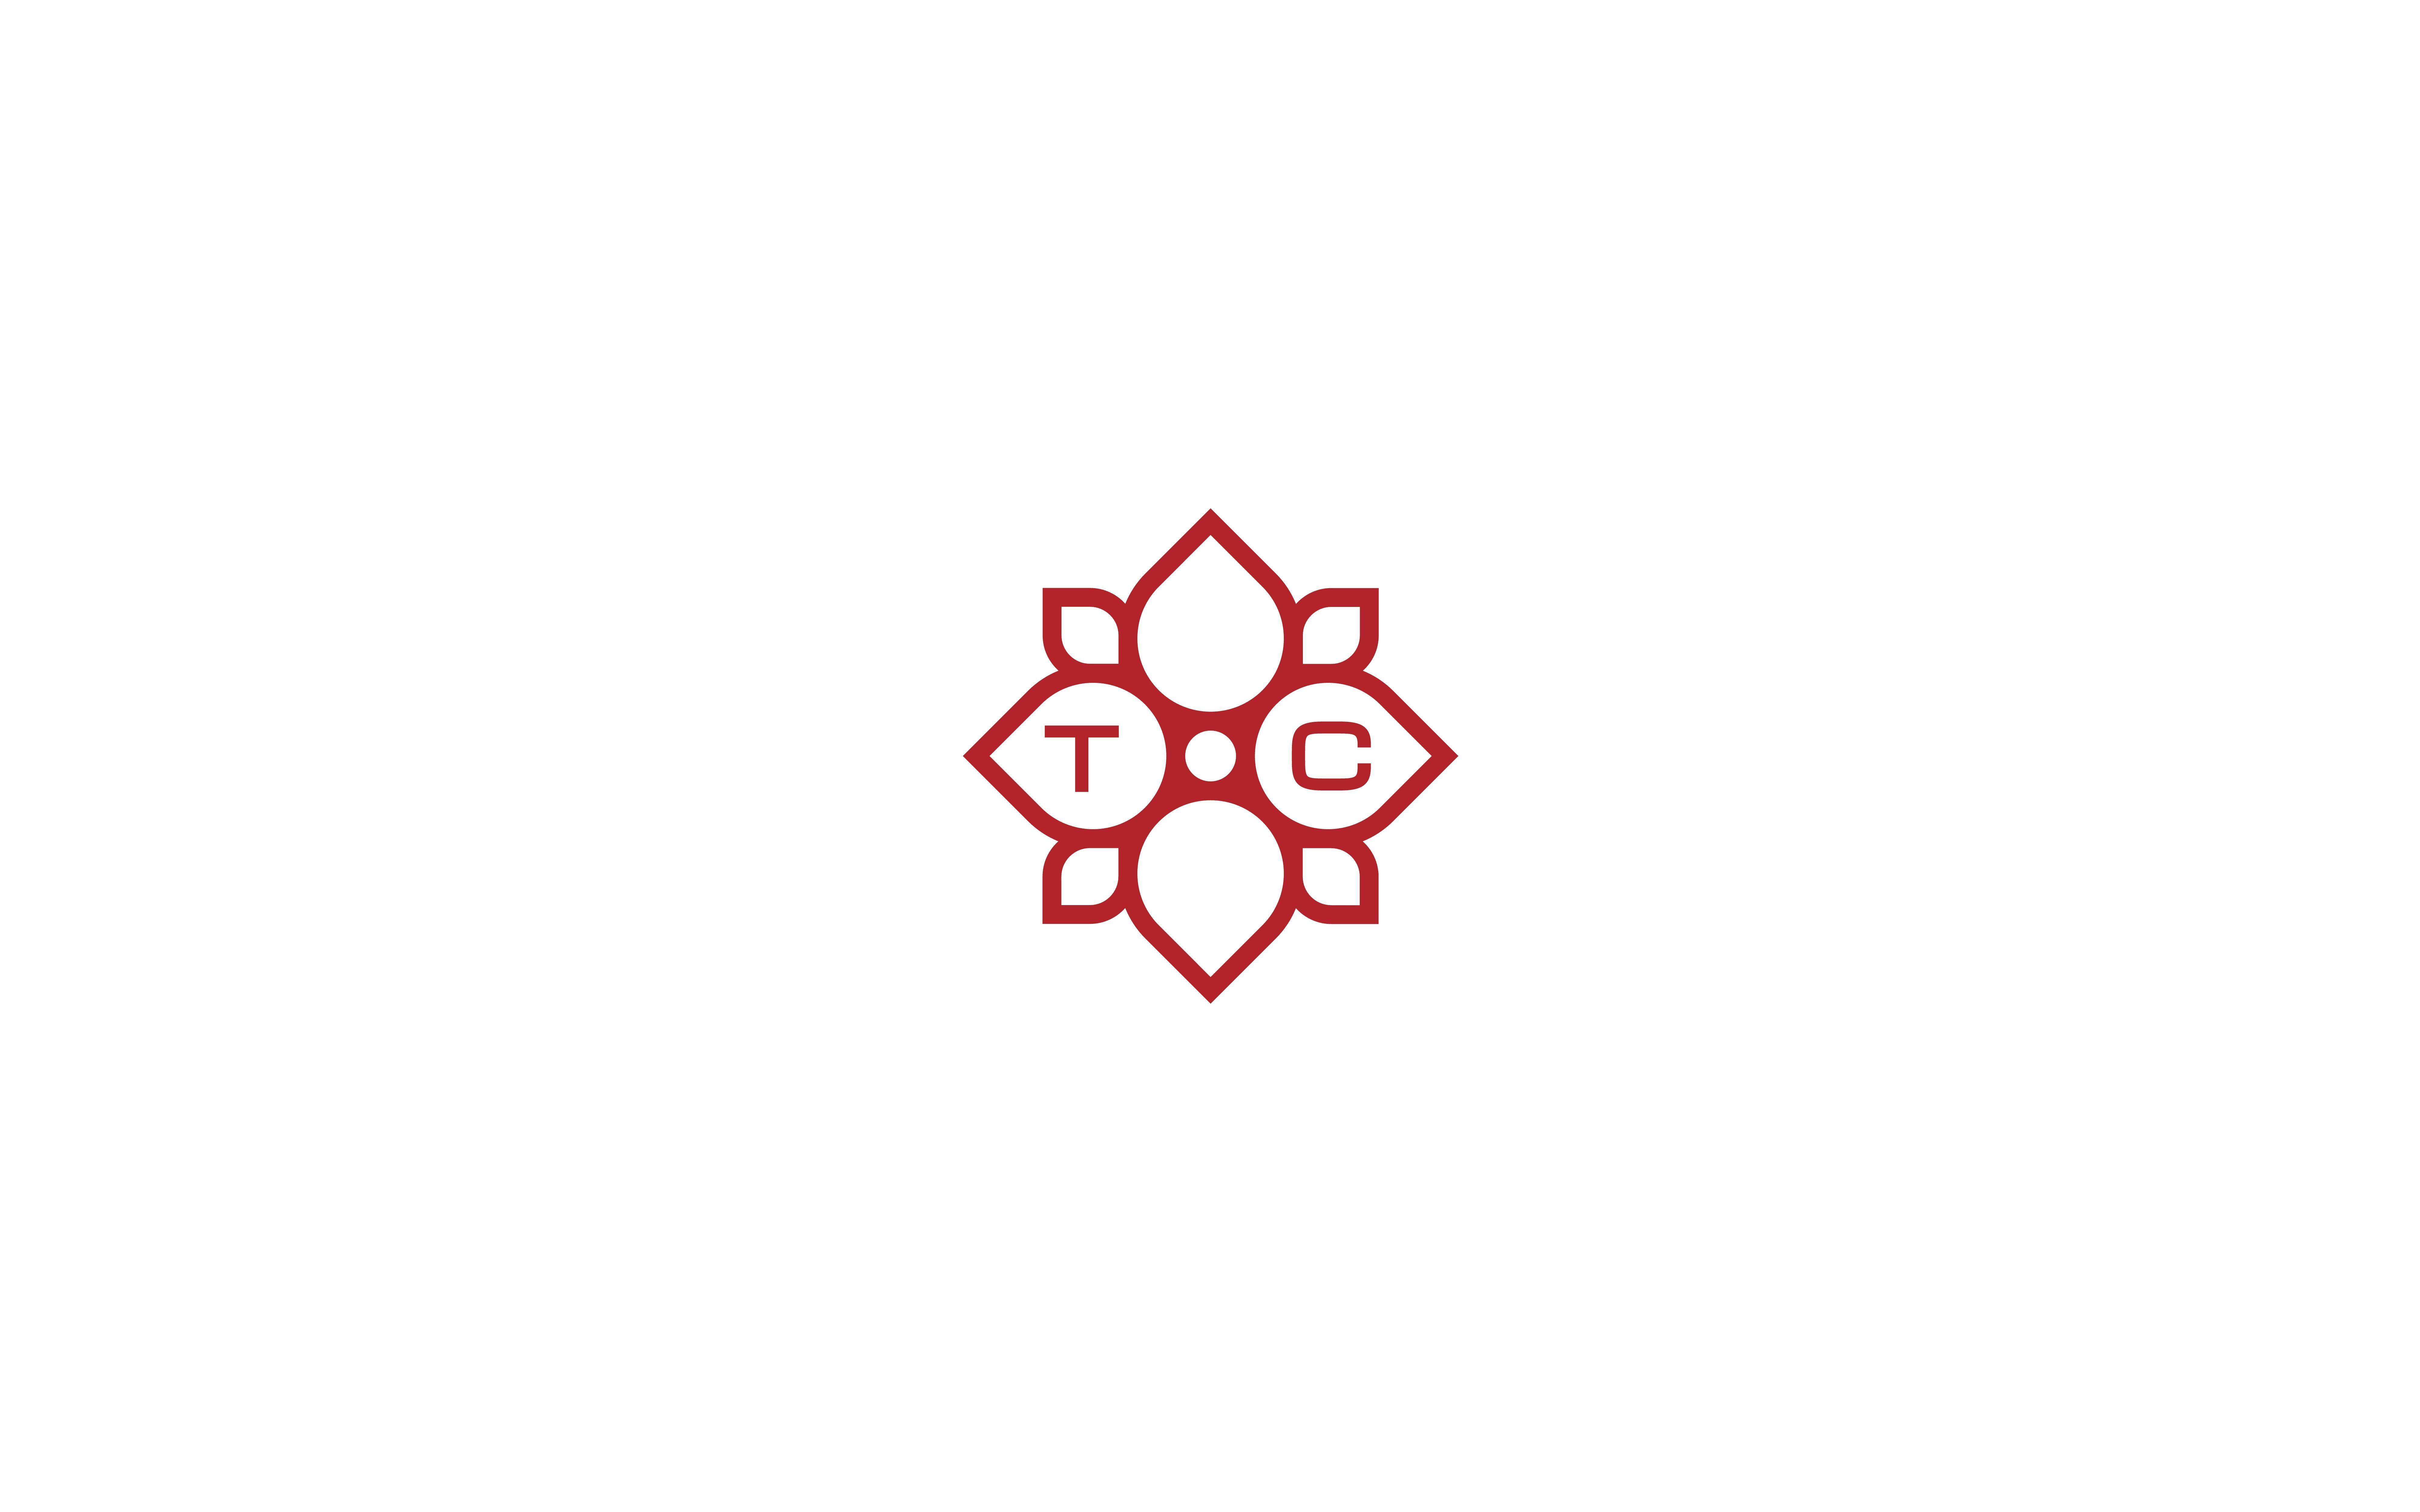 Create TrueCharisma's logo